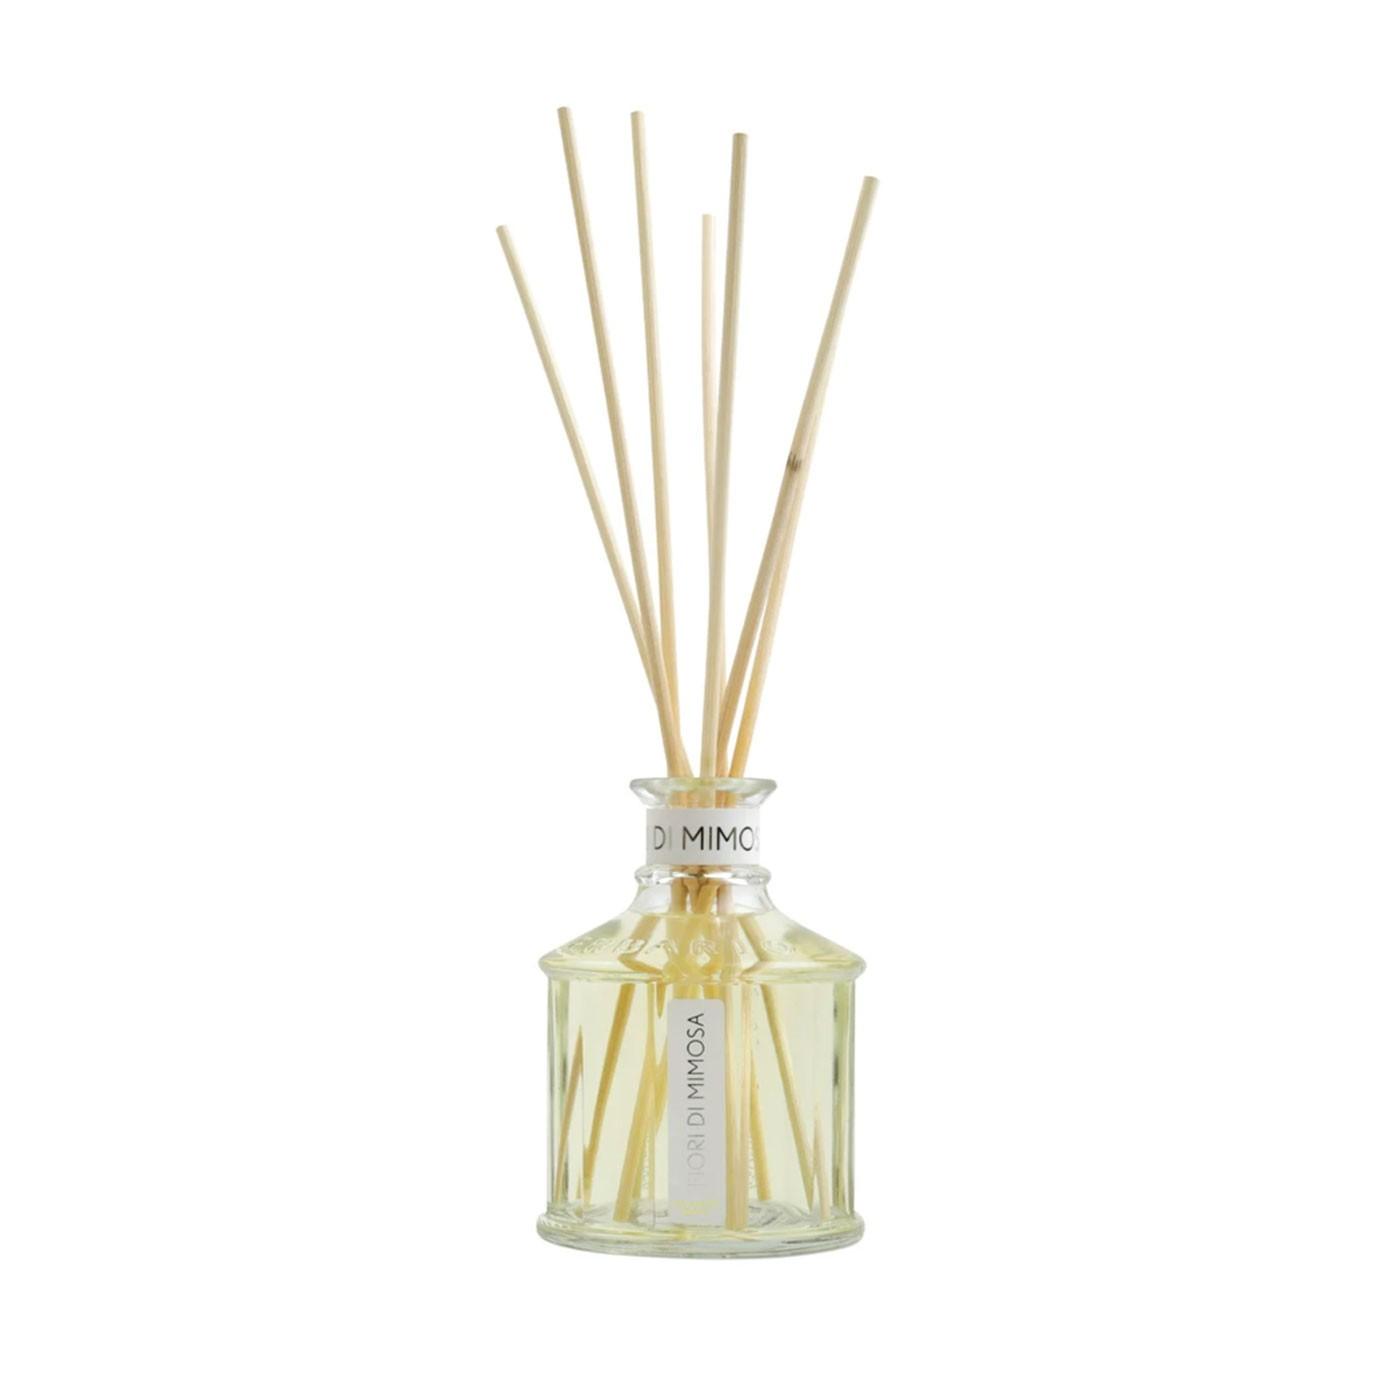 Mimosa Flowers Fragrance Diffuser 8.4 oz - Erbario Toscano | Eataly.com